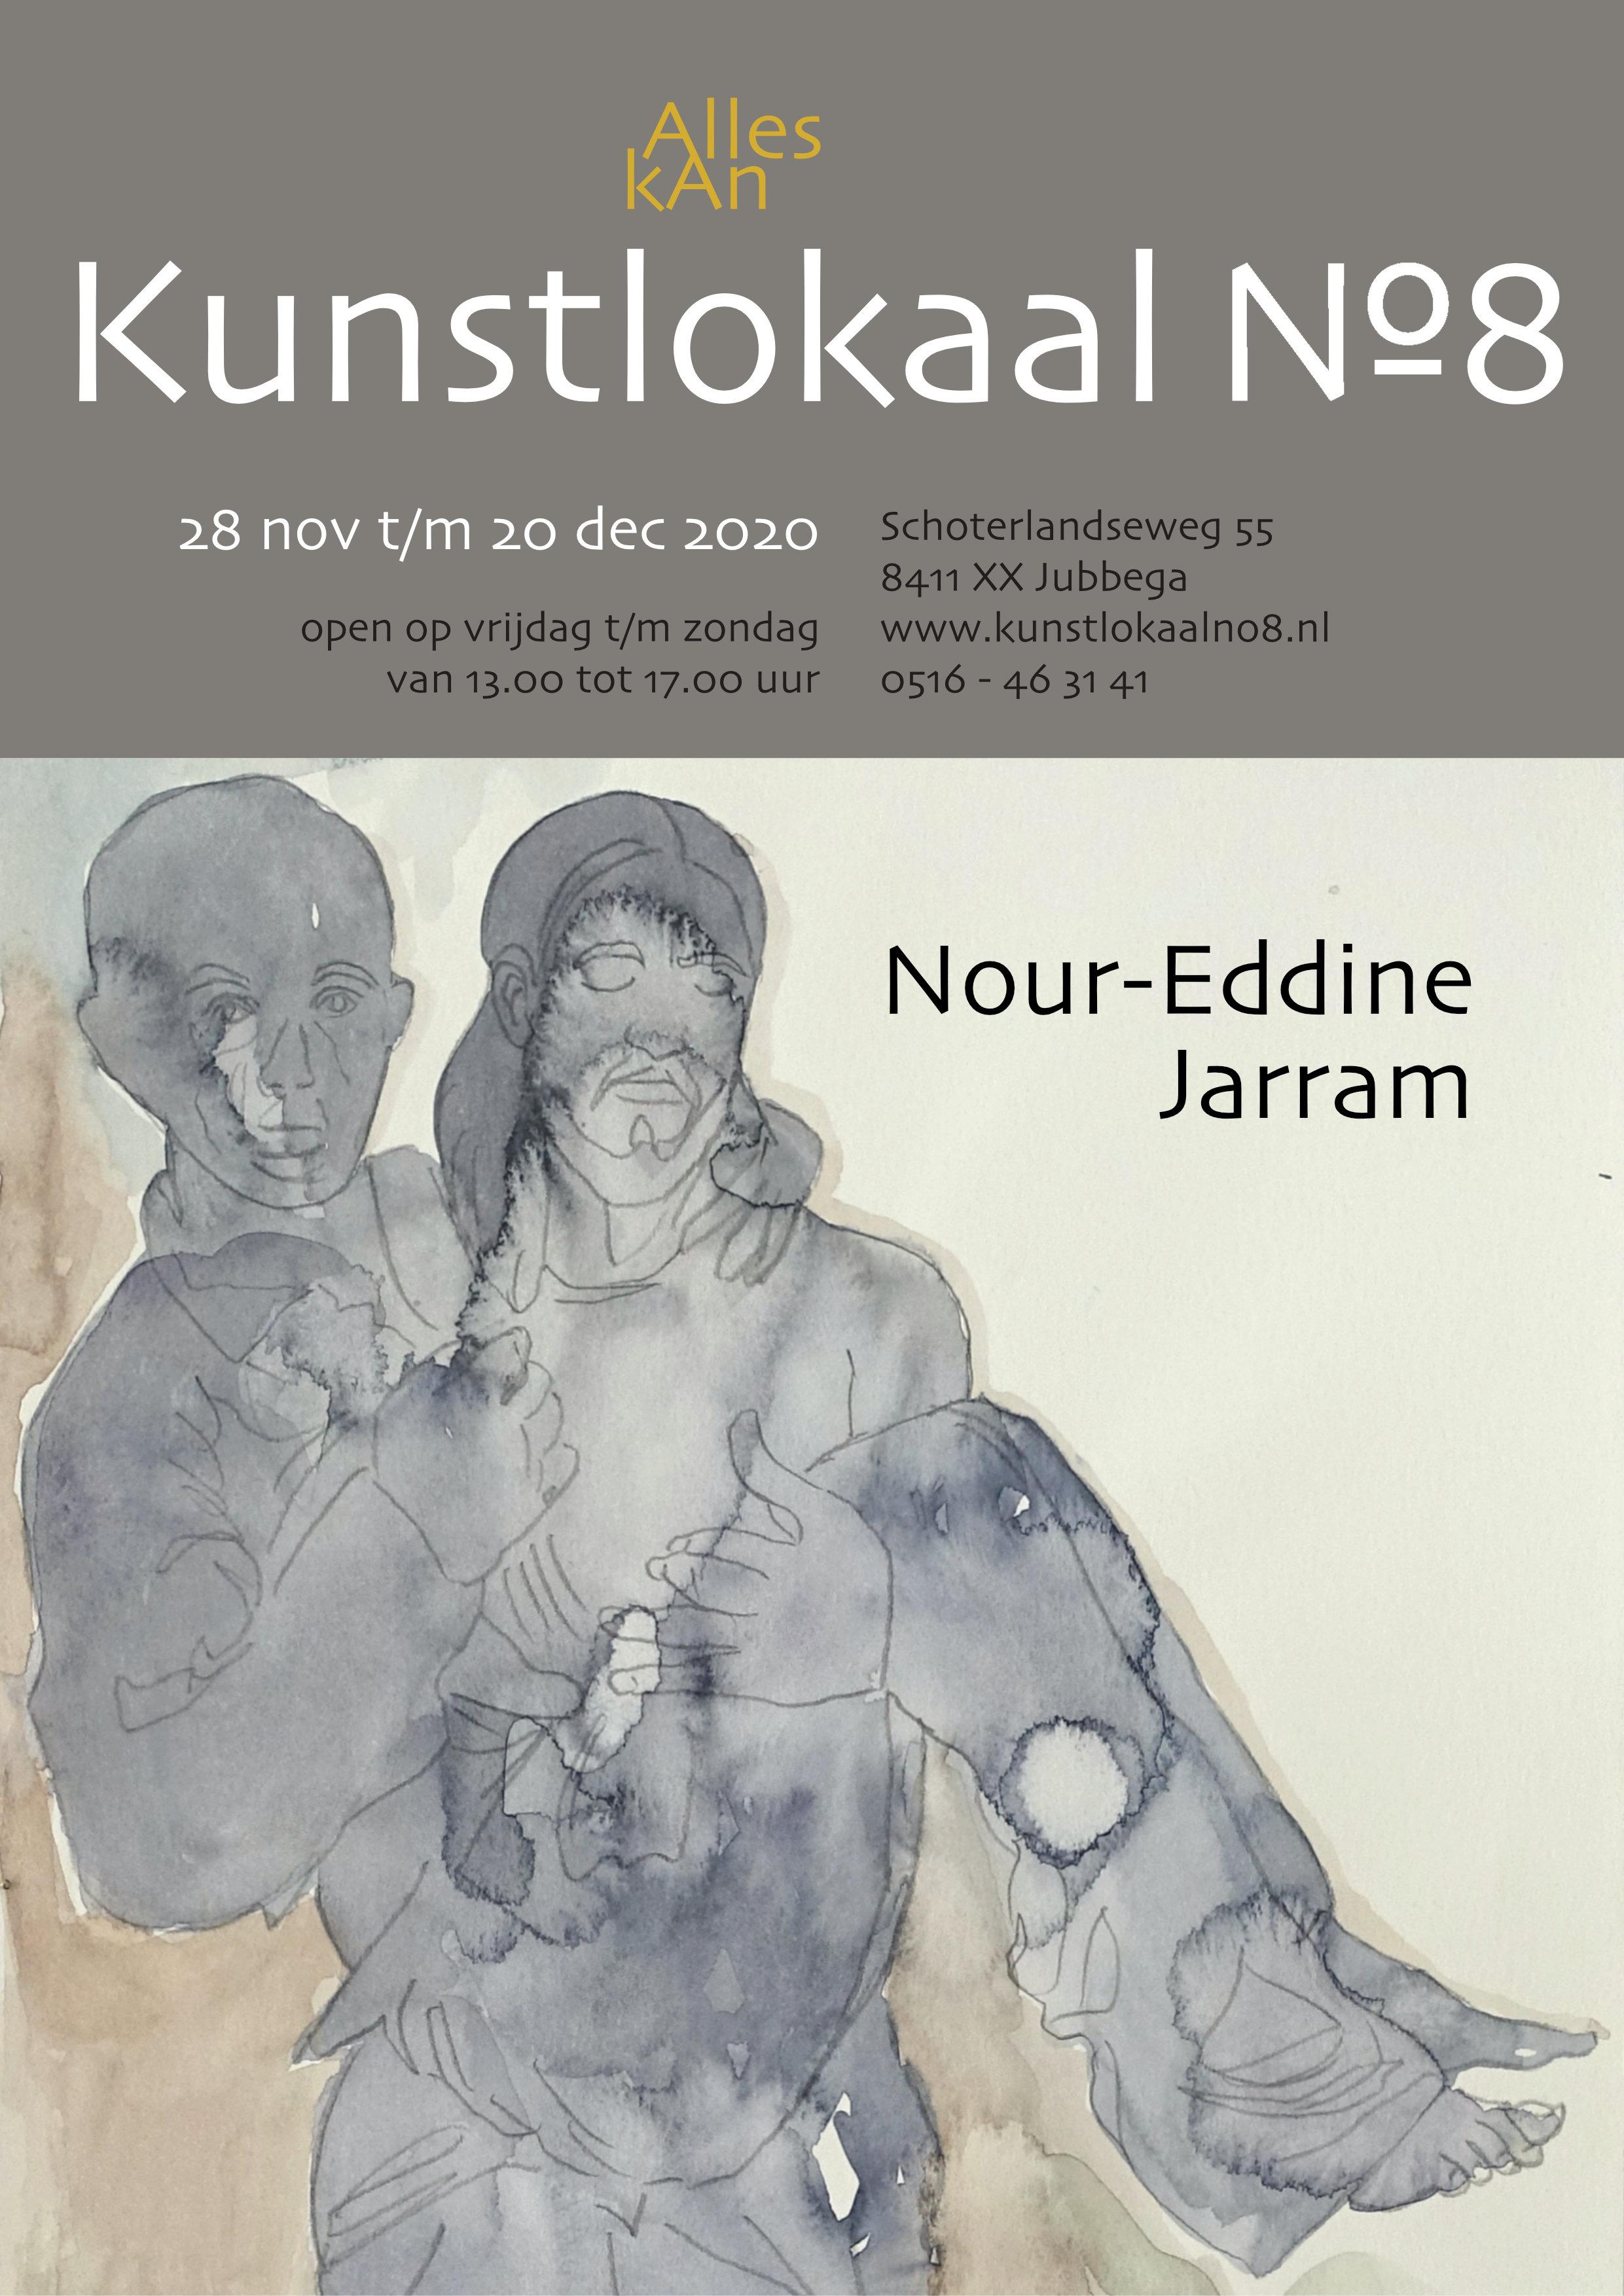 affiche Nour-Eddine Jarram